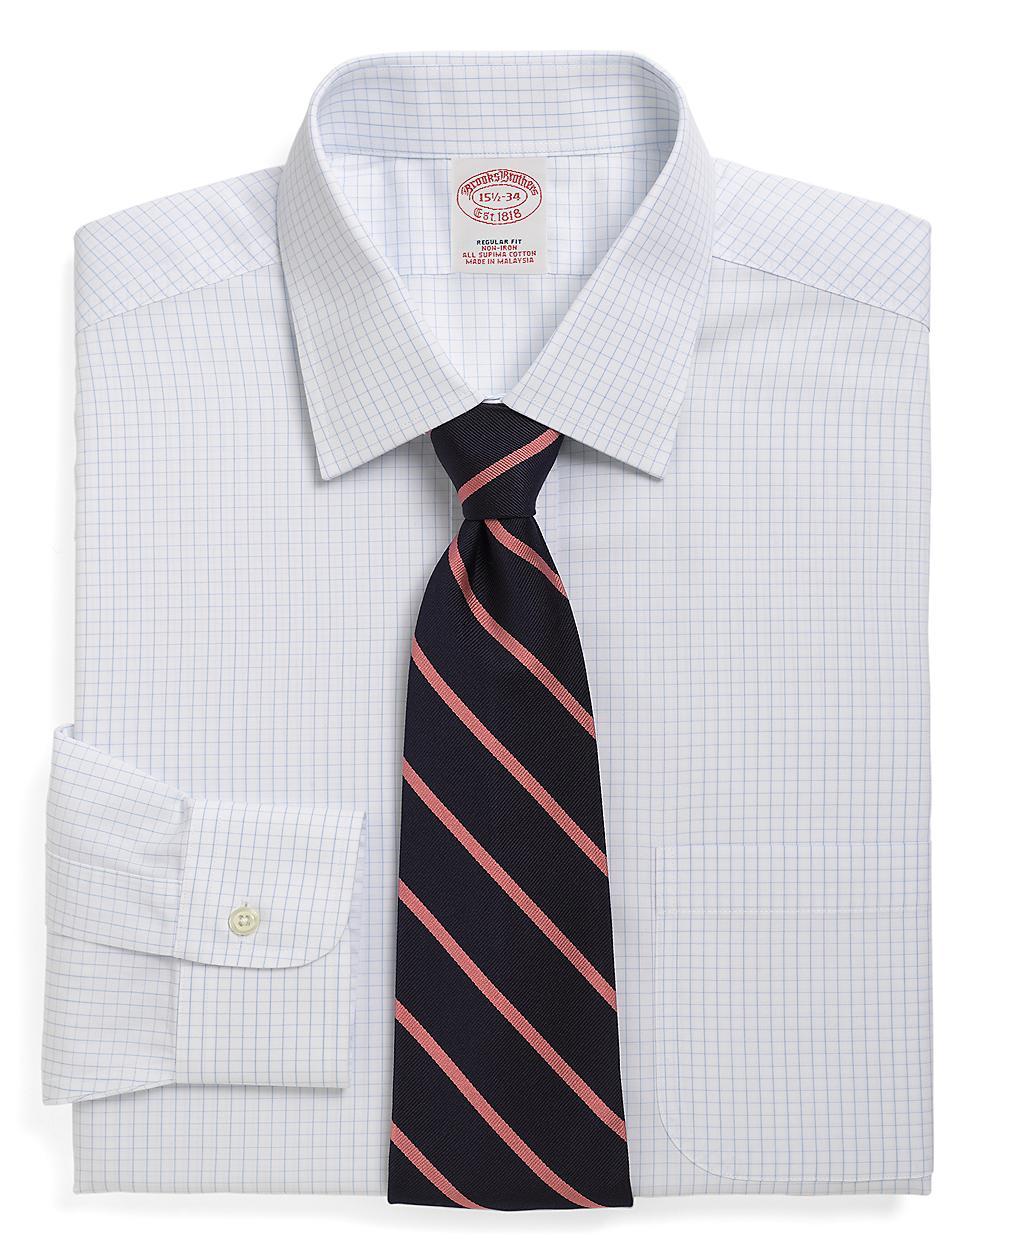 Brooks brothers non iron milano fit medium check dress for Brooks brothers non iron shirts review